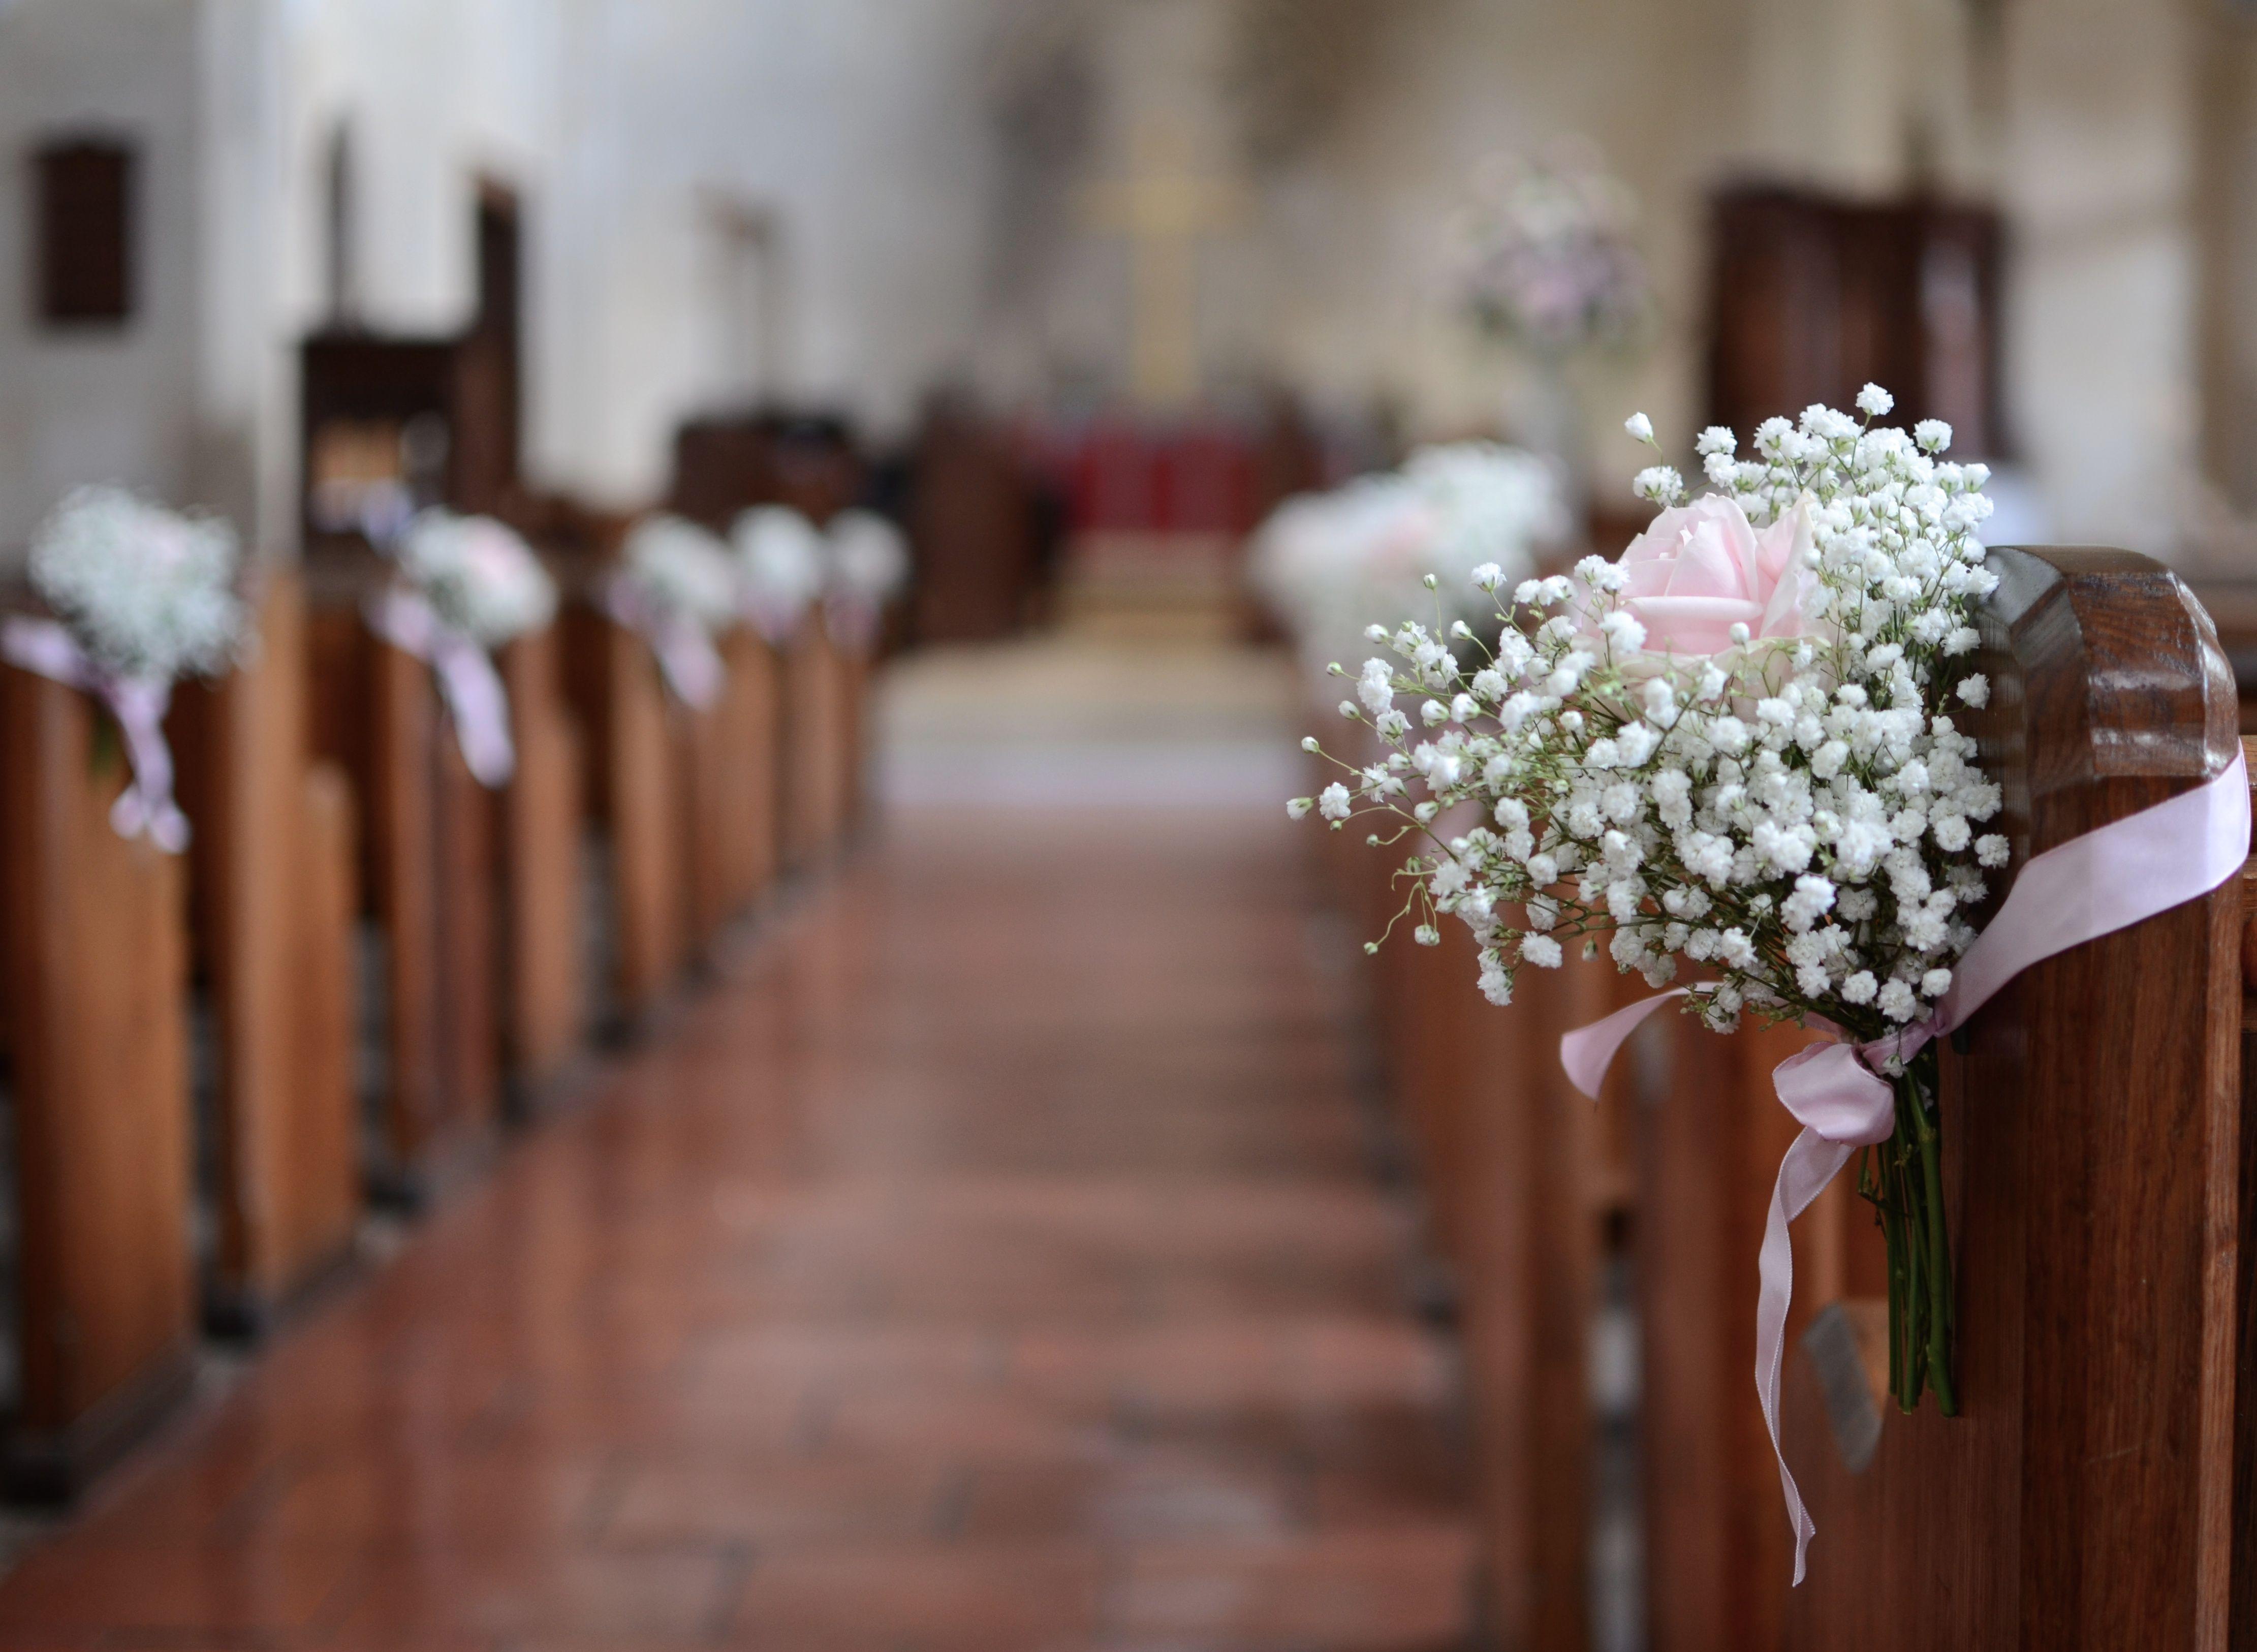 Pew Alternative To Jam Jars Church Pew Wedding Decorations